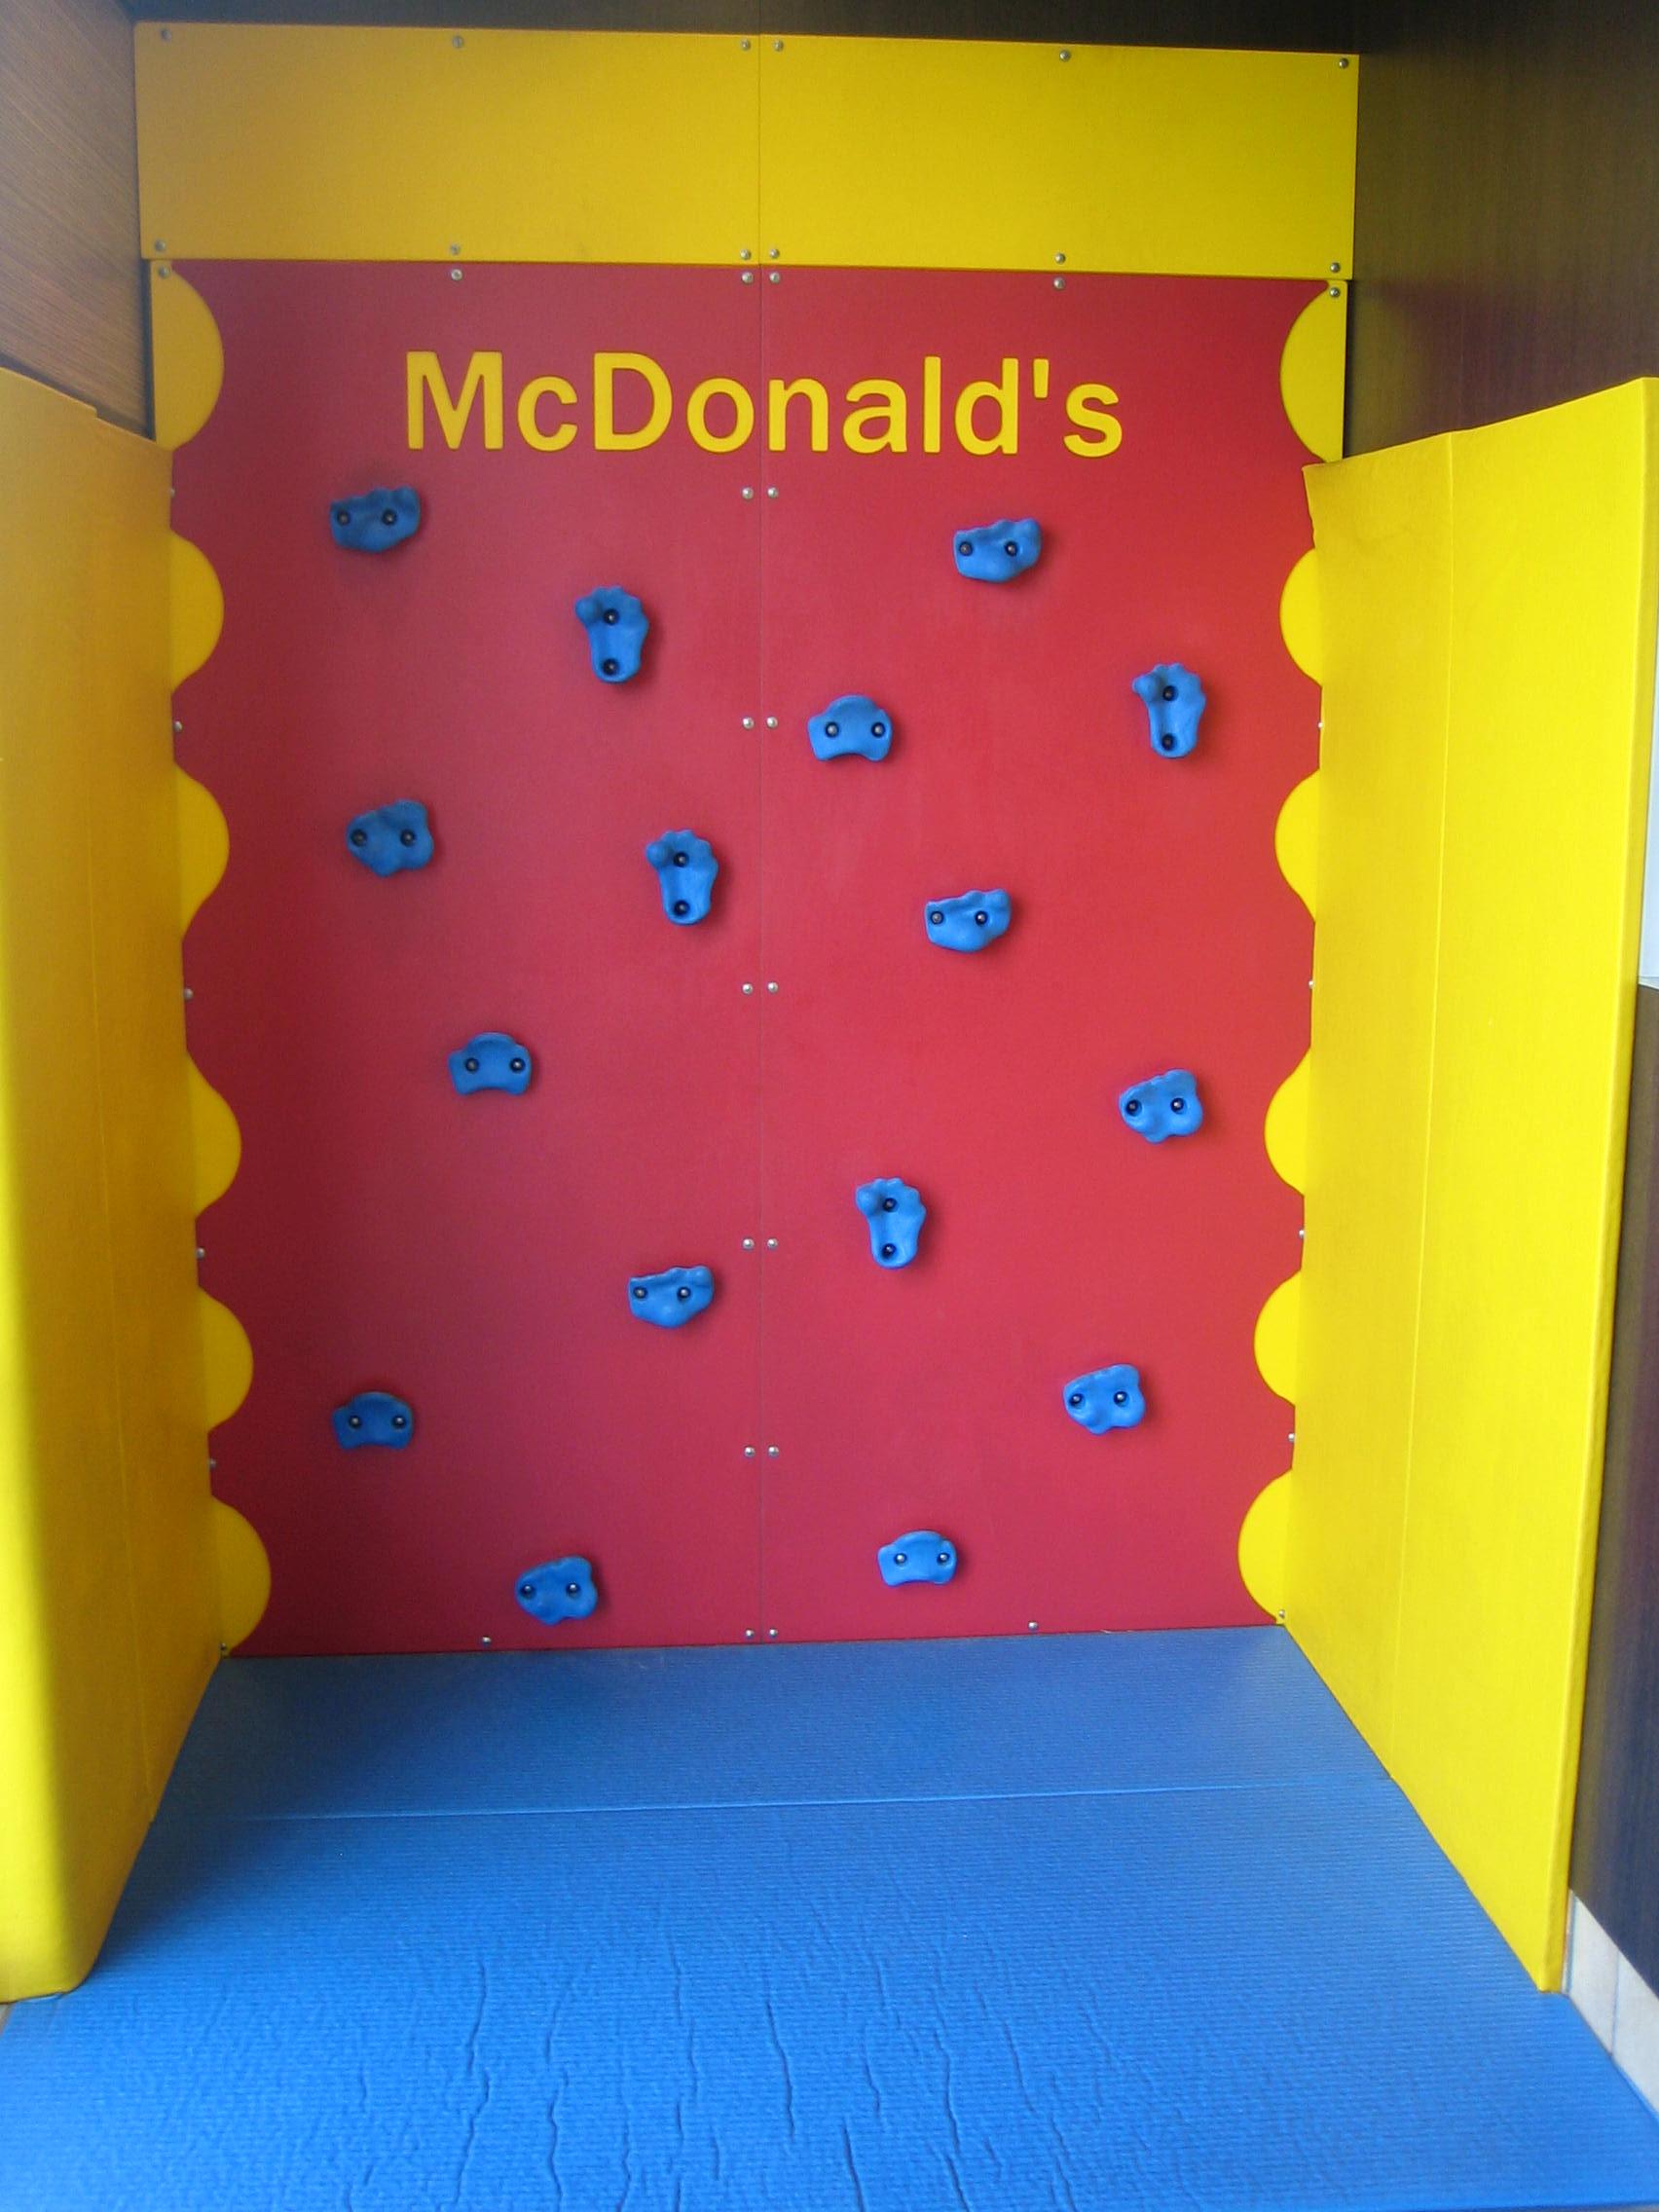 McDonalds Borna